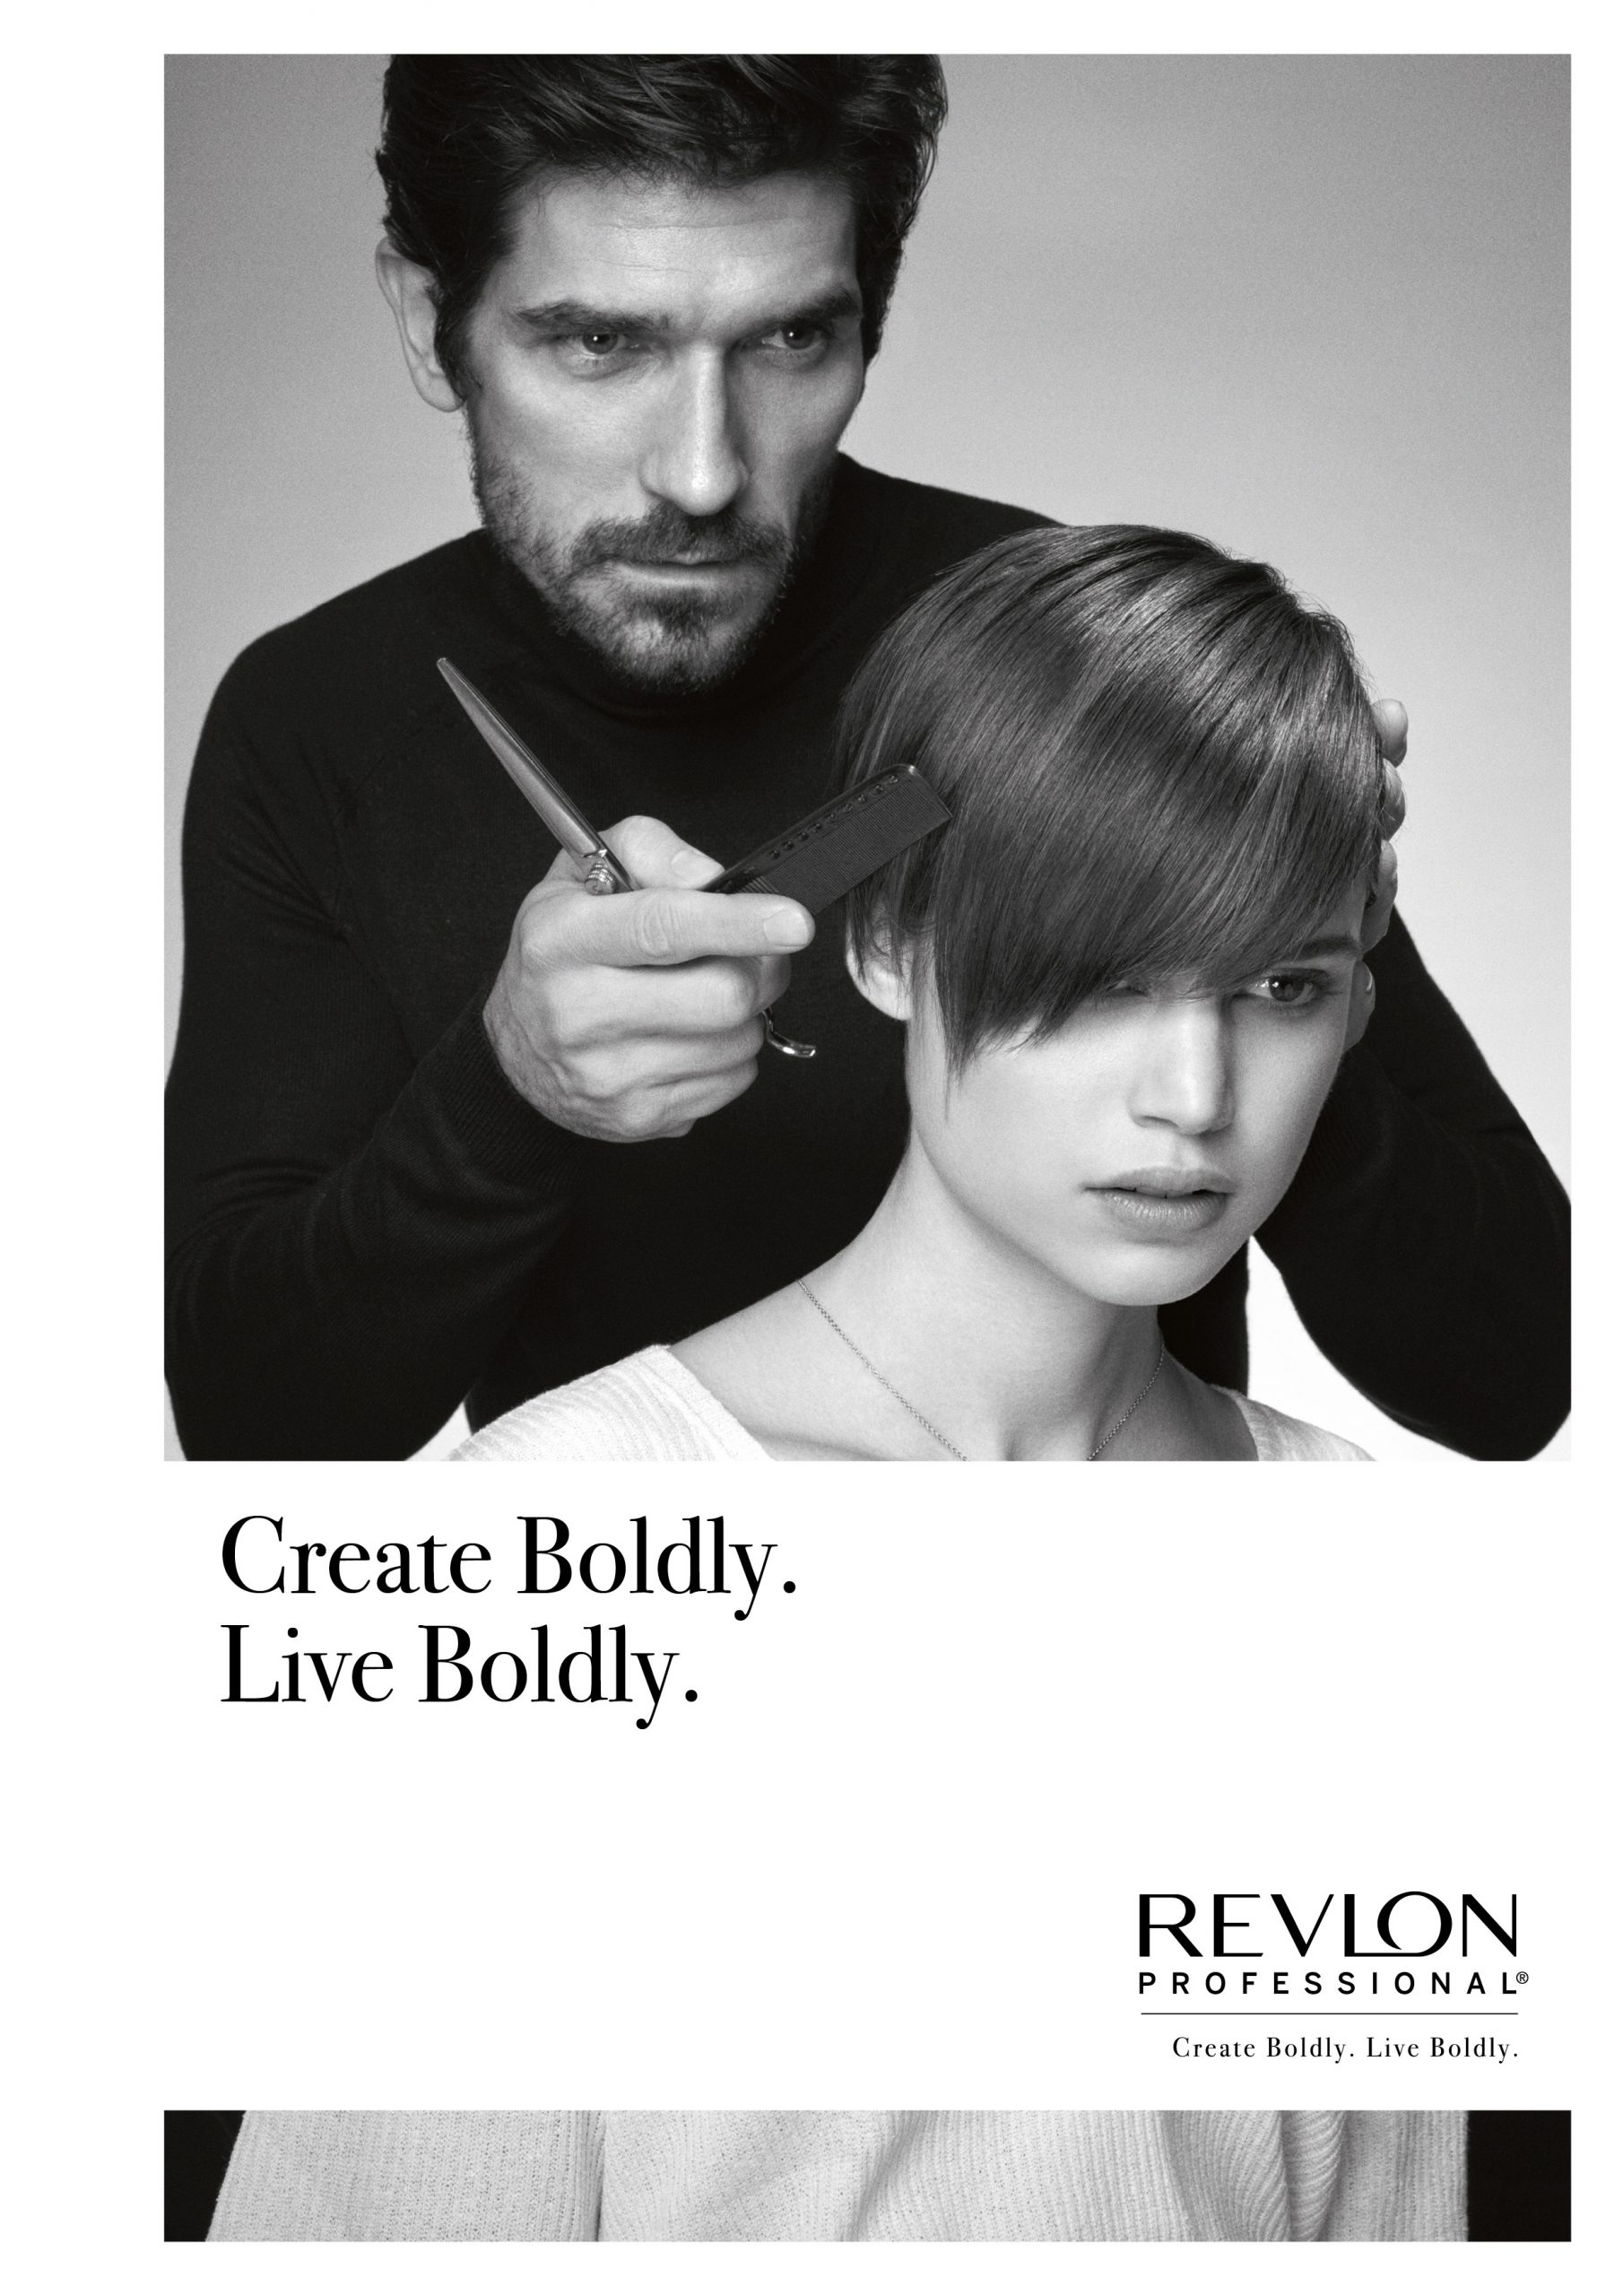 RPB Create Boldly. Live Boldly. scaled